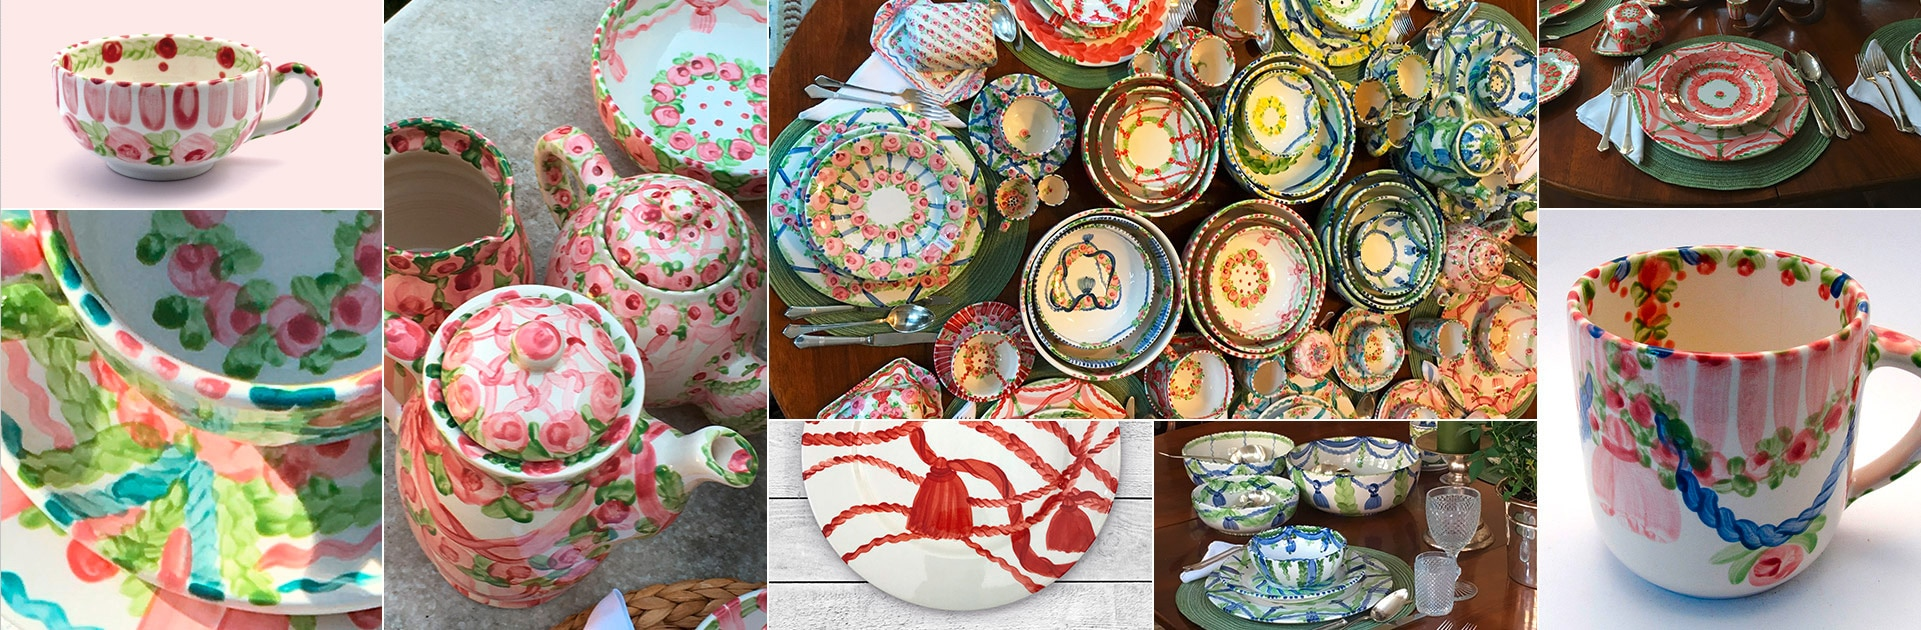 Keramik Geschirr Mode Handmade Manufaktur Hernuss